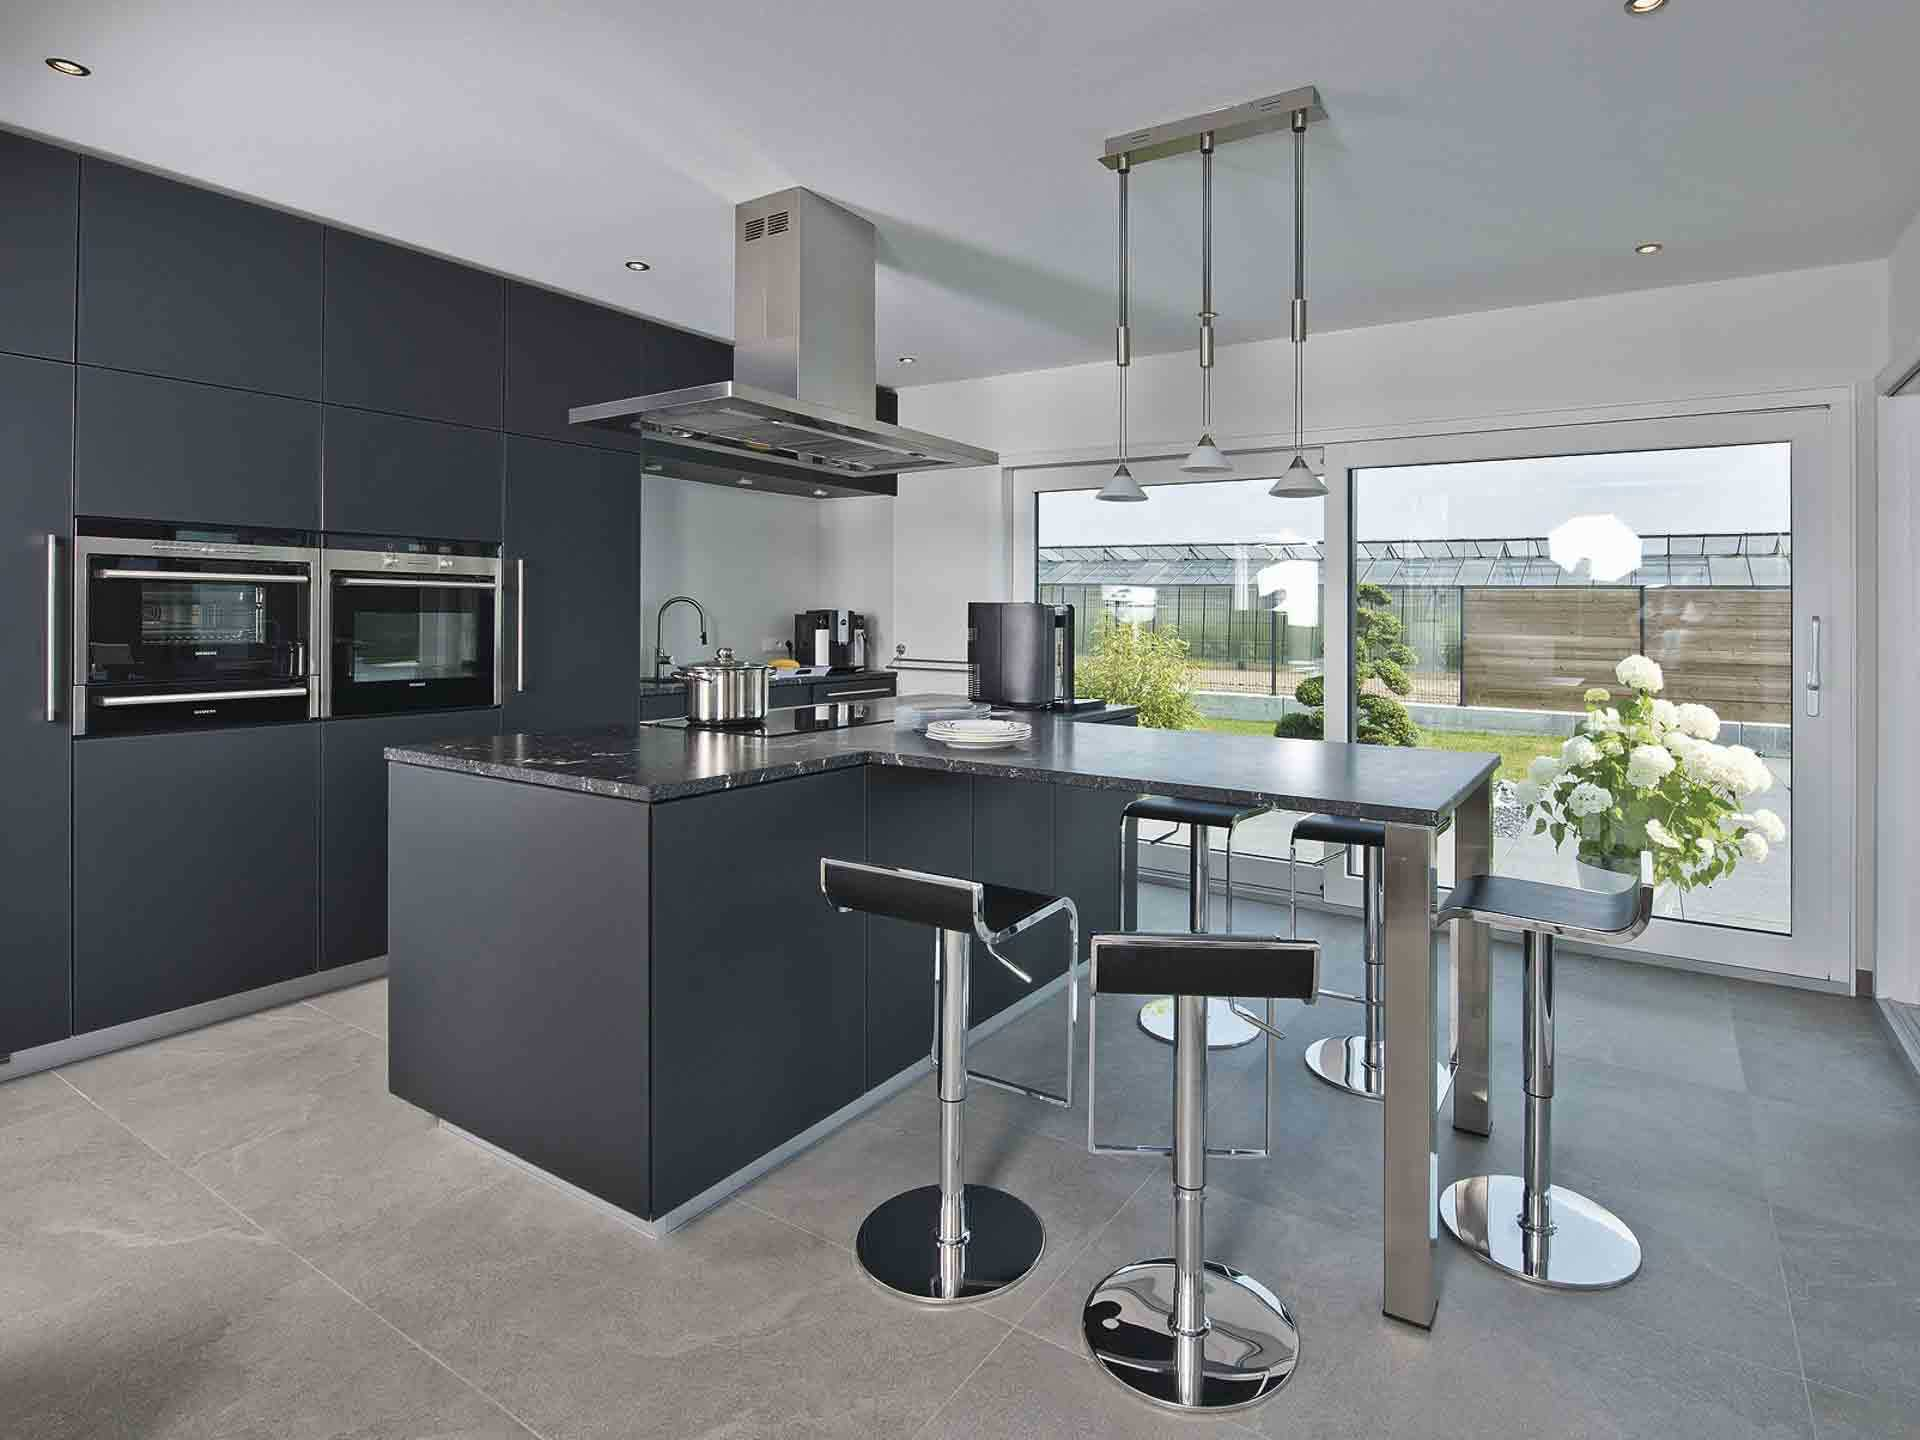 luxusvilla im bauhaus stil weberhaus. Black Bedroom Furniture Sets. Home Design Ideas